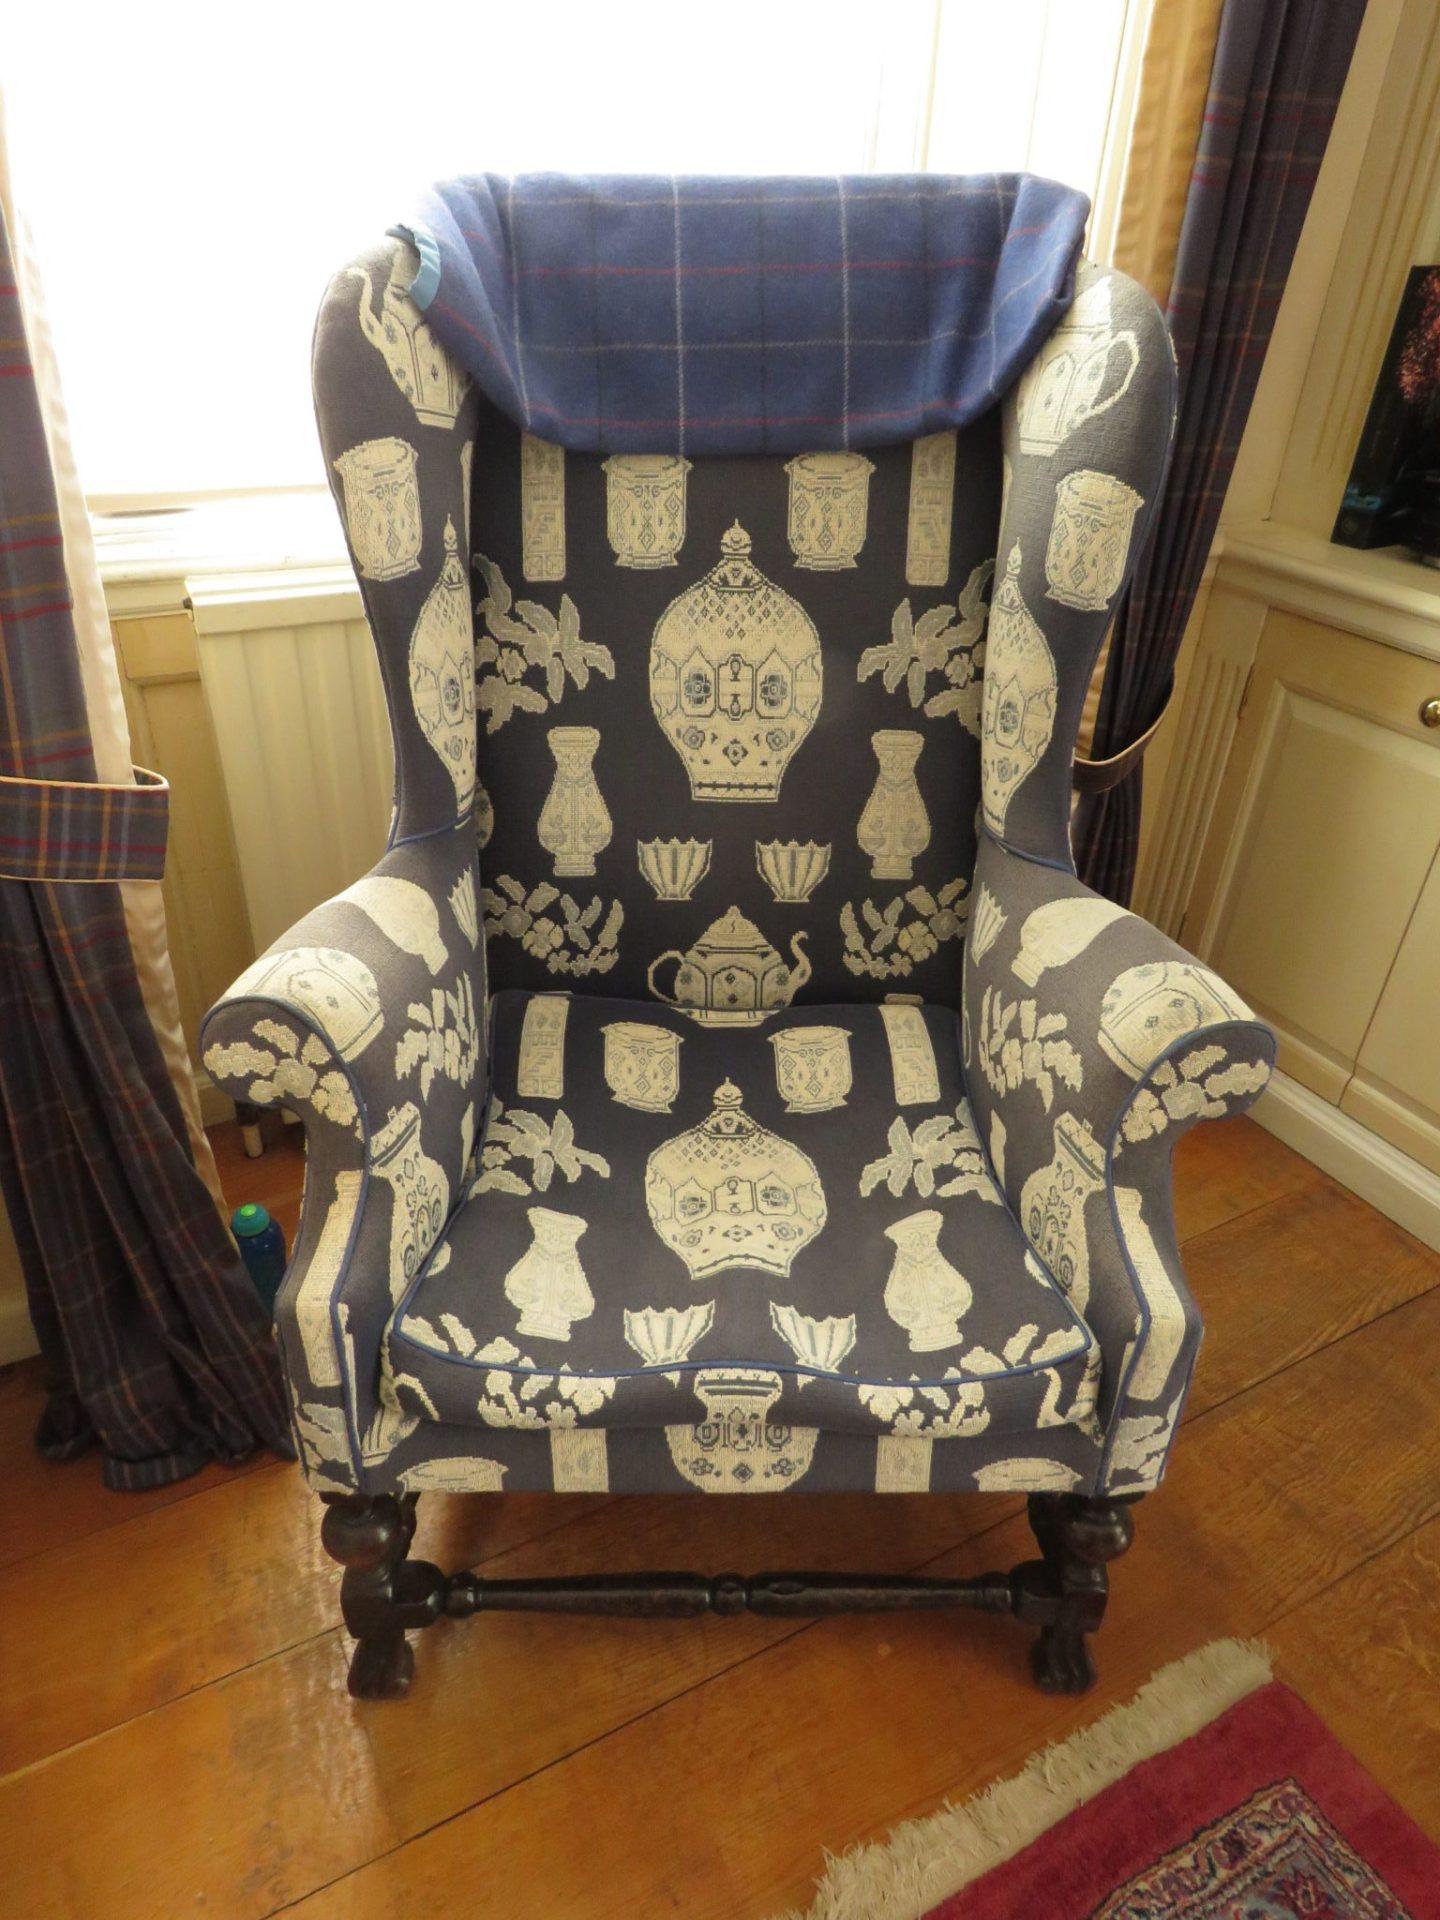 Sir Edward Heath's Teaport Chair, Arundells, Salisbury